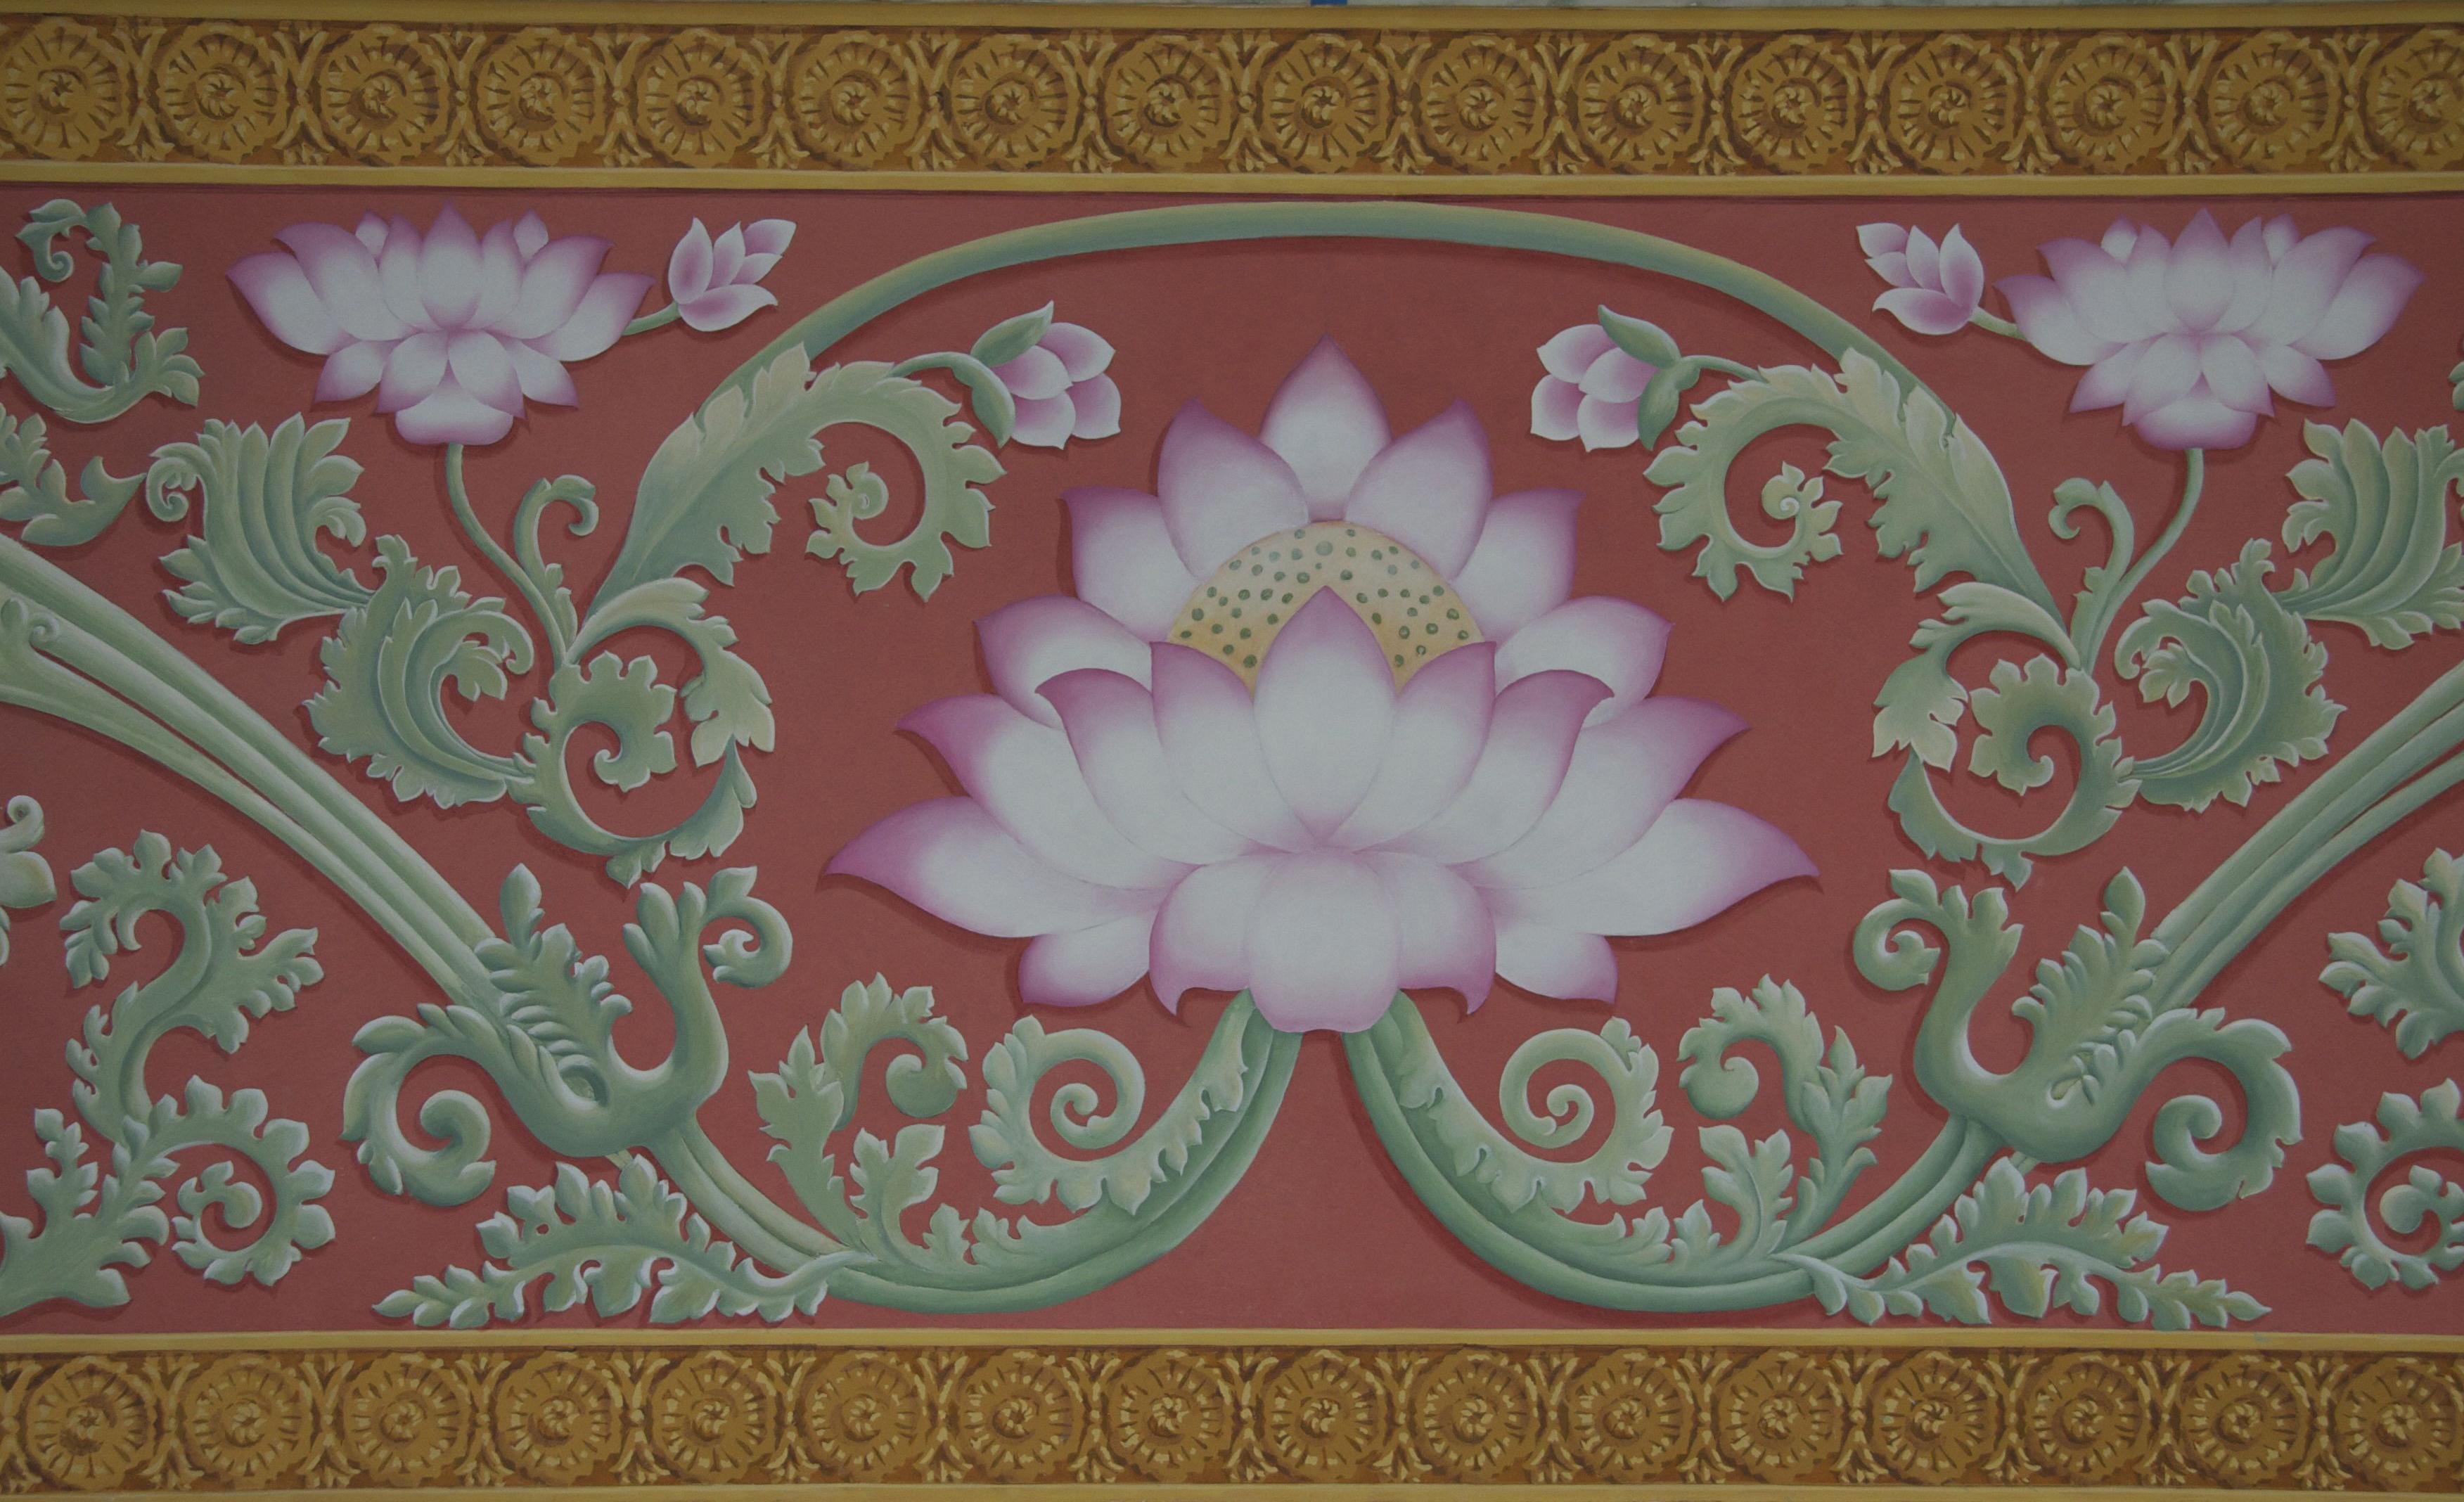 altar decorative center.jpg